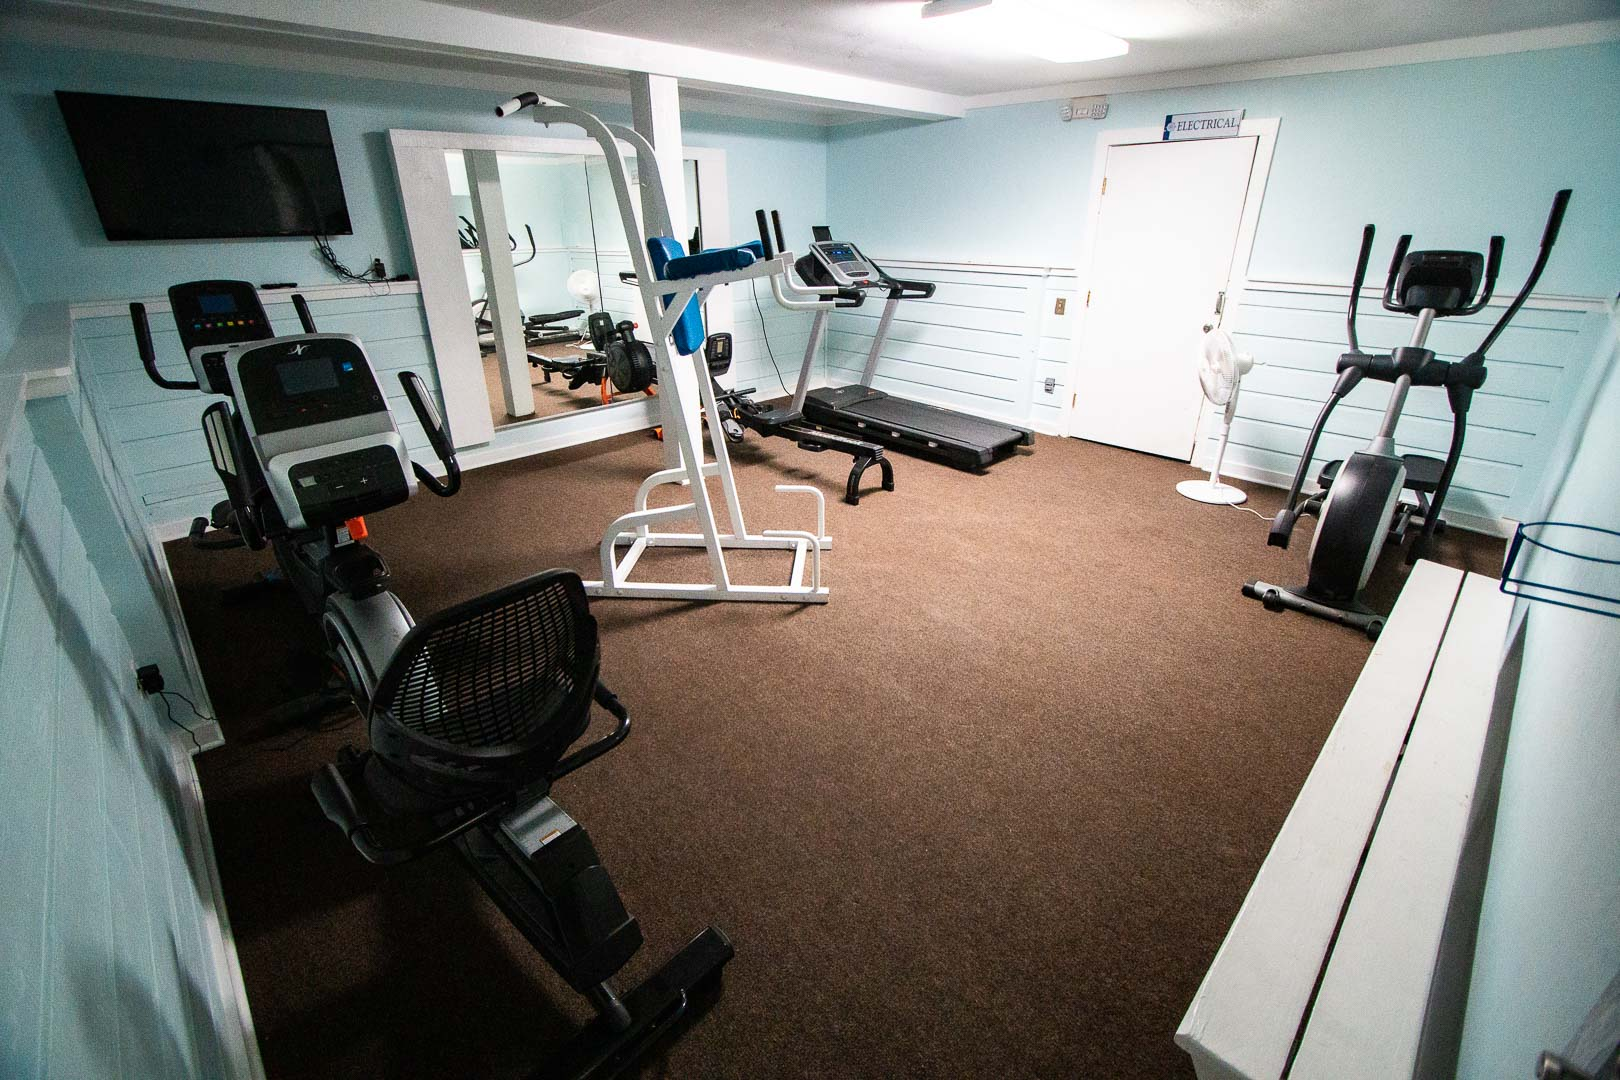 Indoor gym room at VRI's Barrier Island Station in North Carolina.